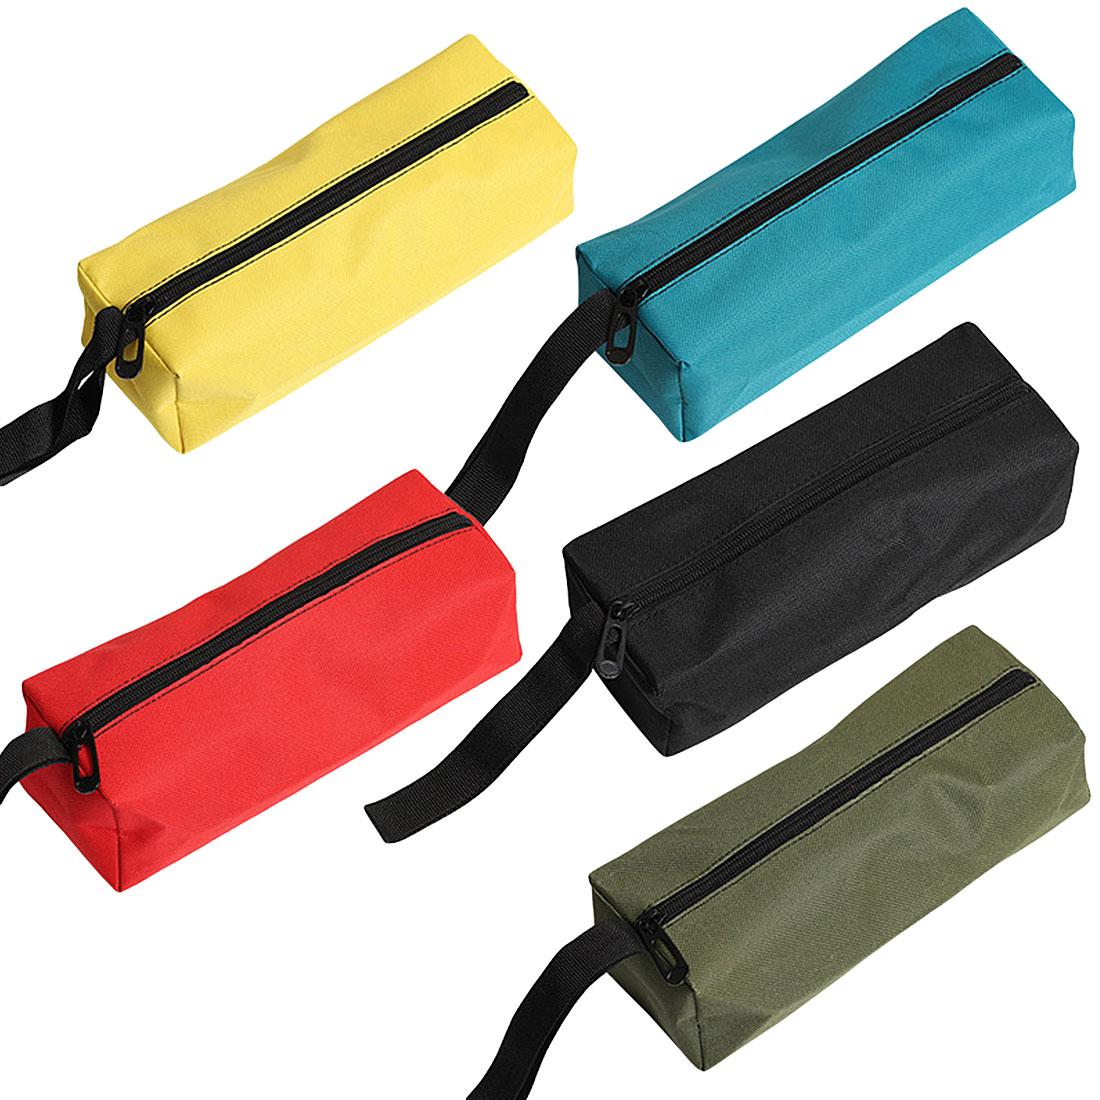 1pcs Hand Tool Bag For Small Screws Nails Drill Bit Metal Parts Tools Bag Waterproof Canvas Instrument Case Organizer